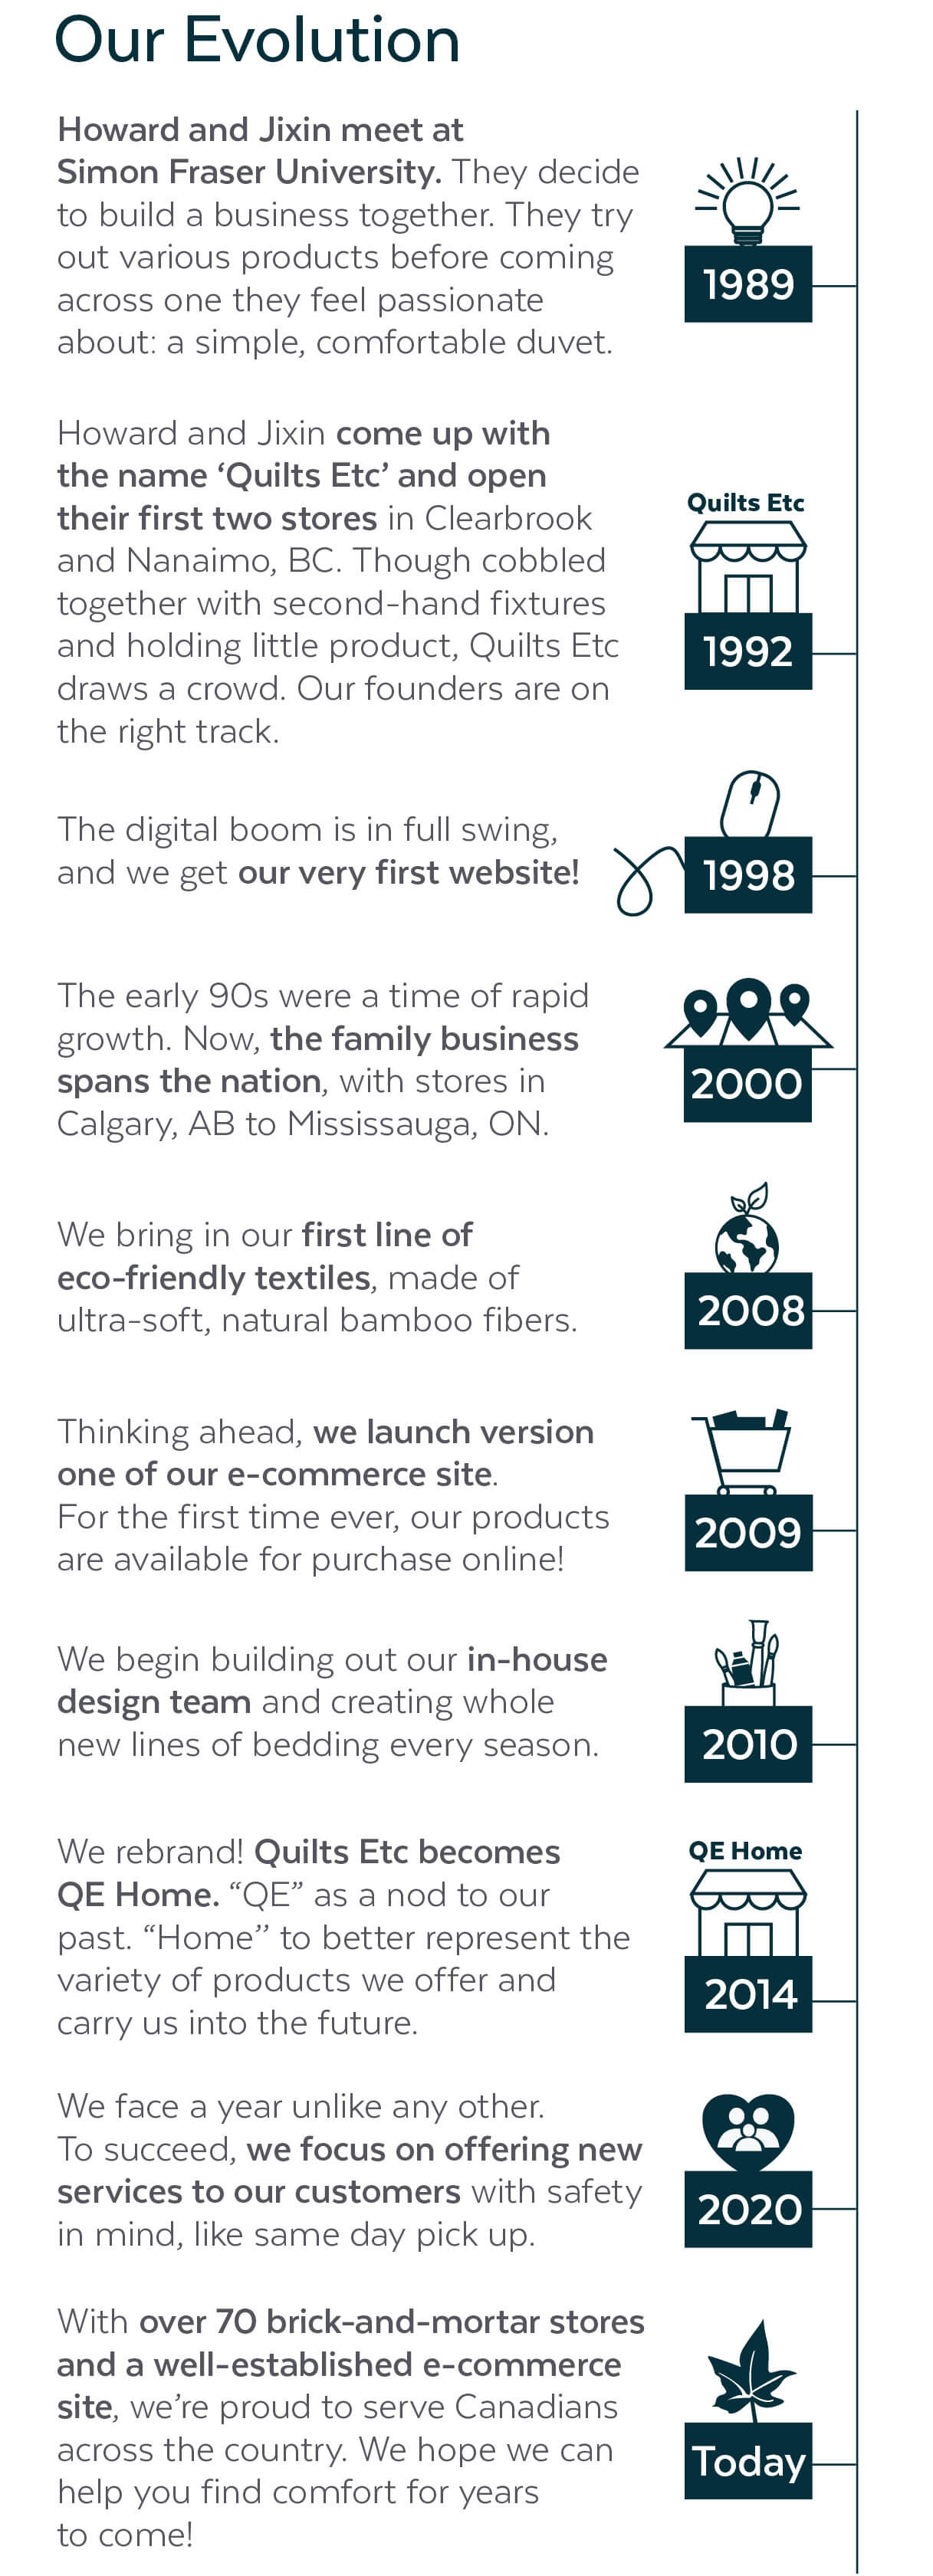 QE Home's evolution